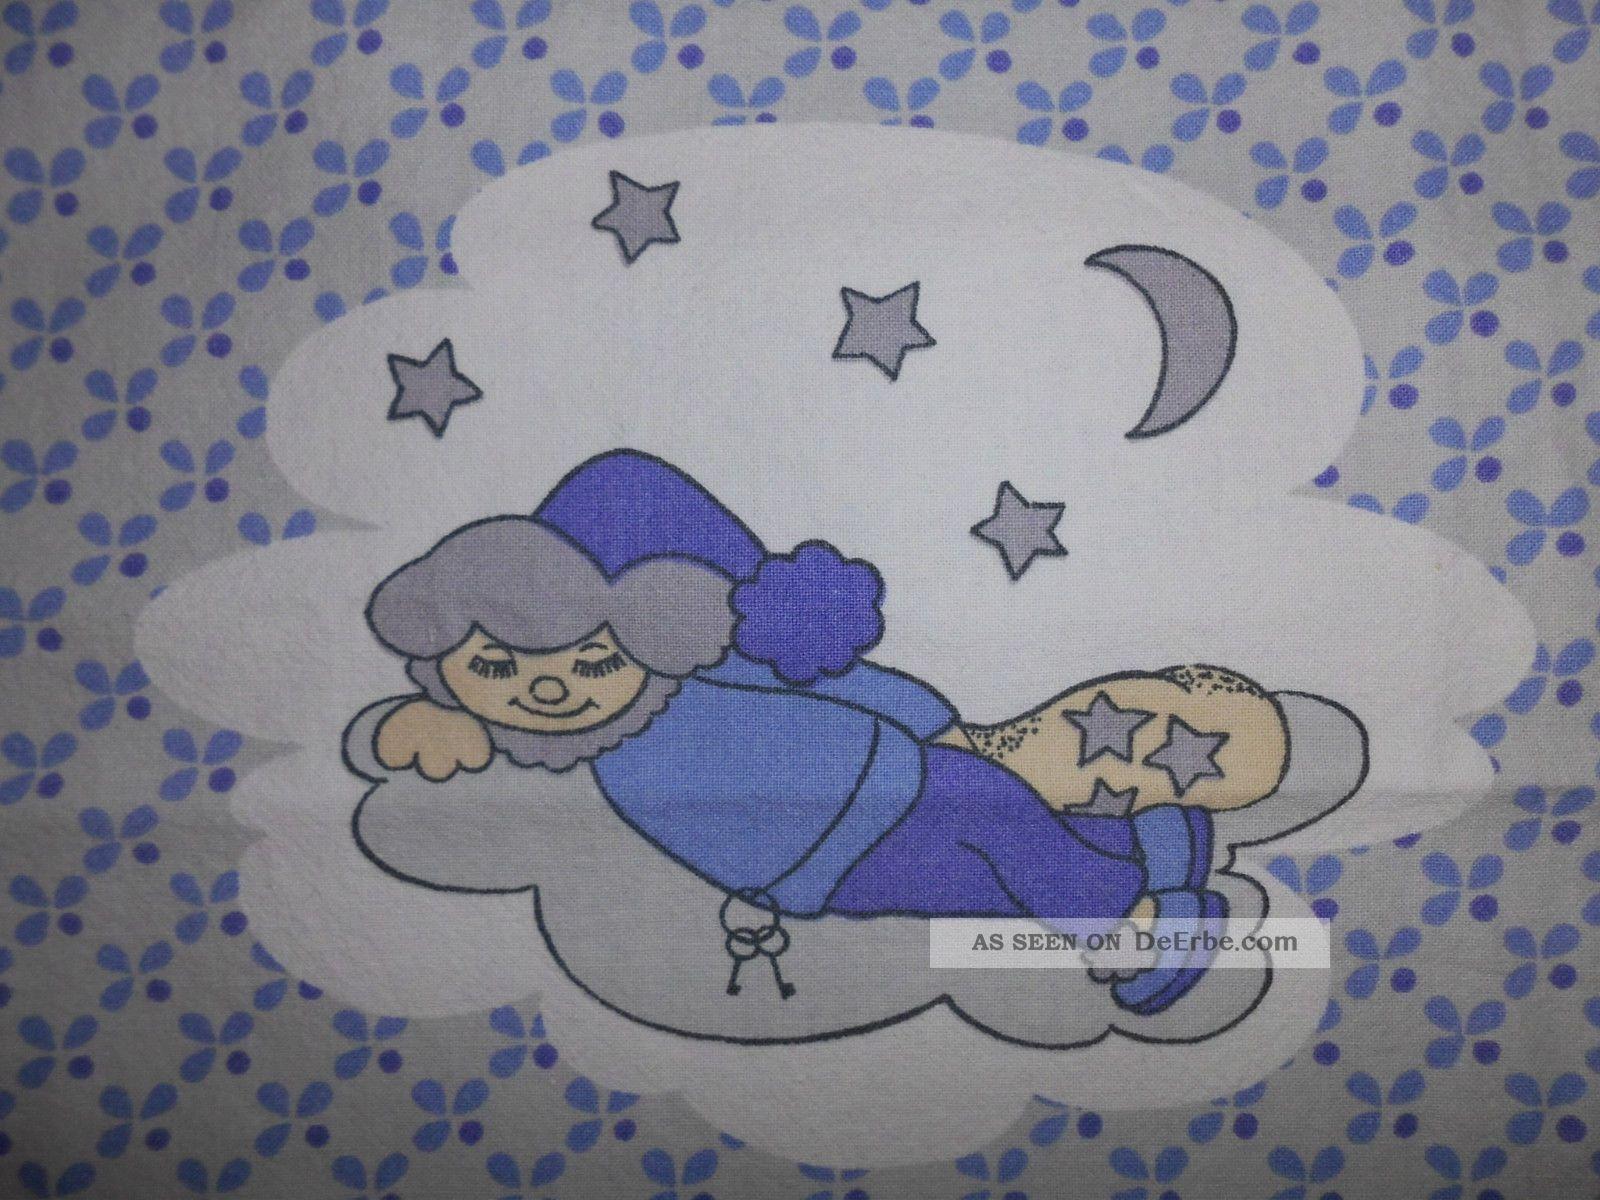 Sandmännchen Baby Kinder Bettwäsche Vintage 70er 80er Graziela - Ära Sandmann Süß 1970-1979 Bild